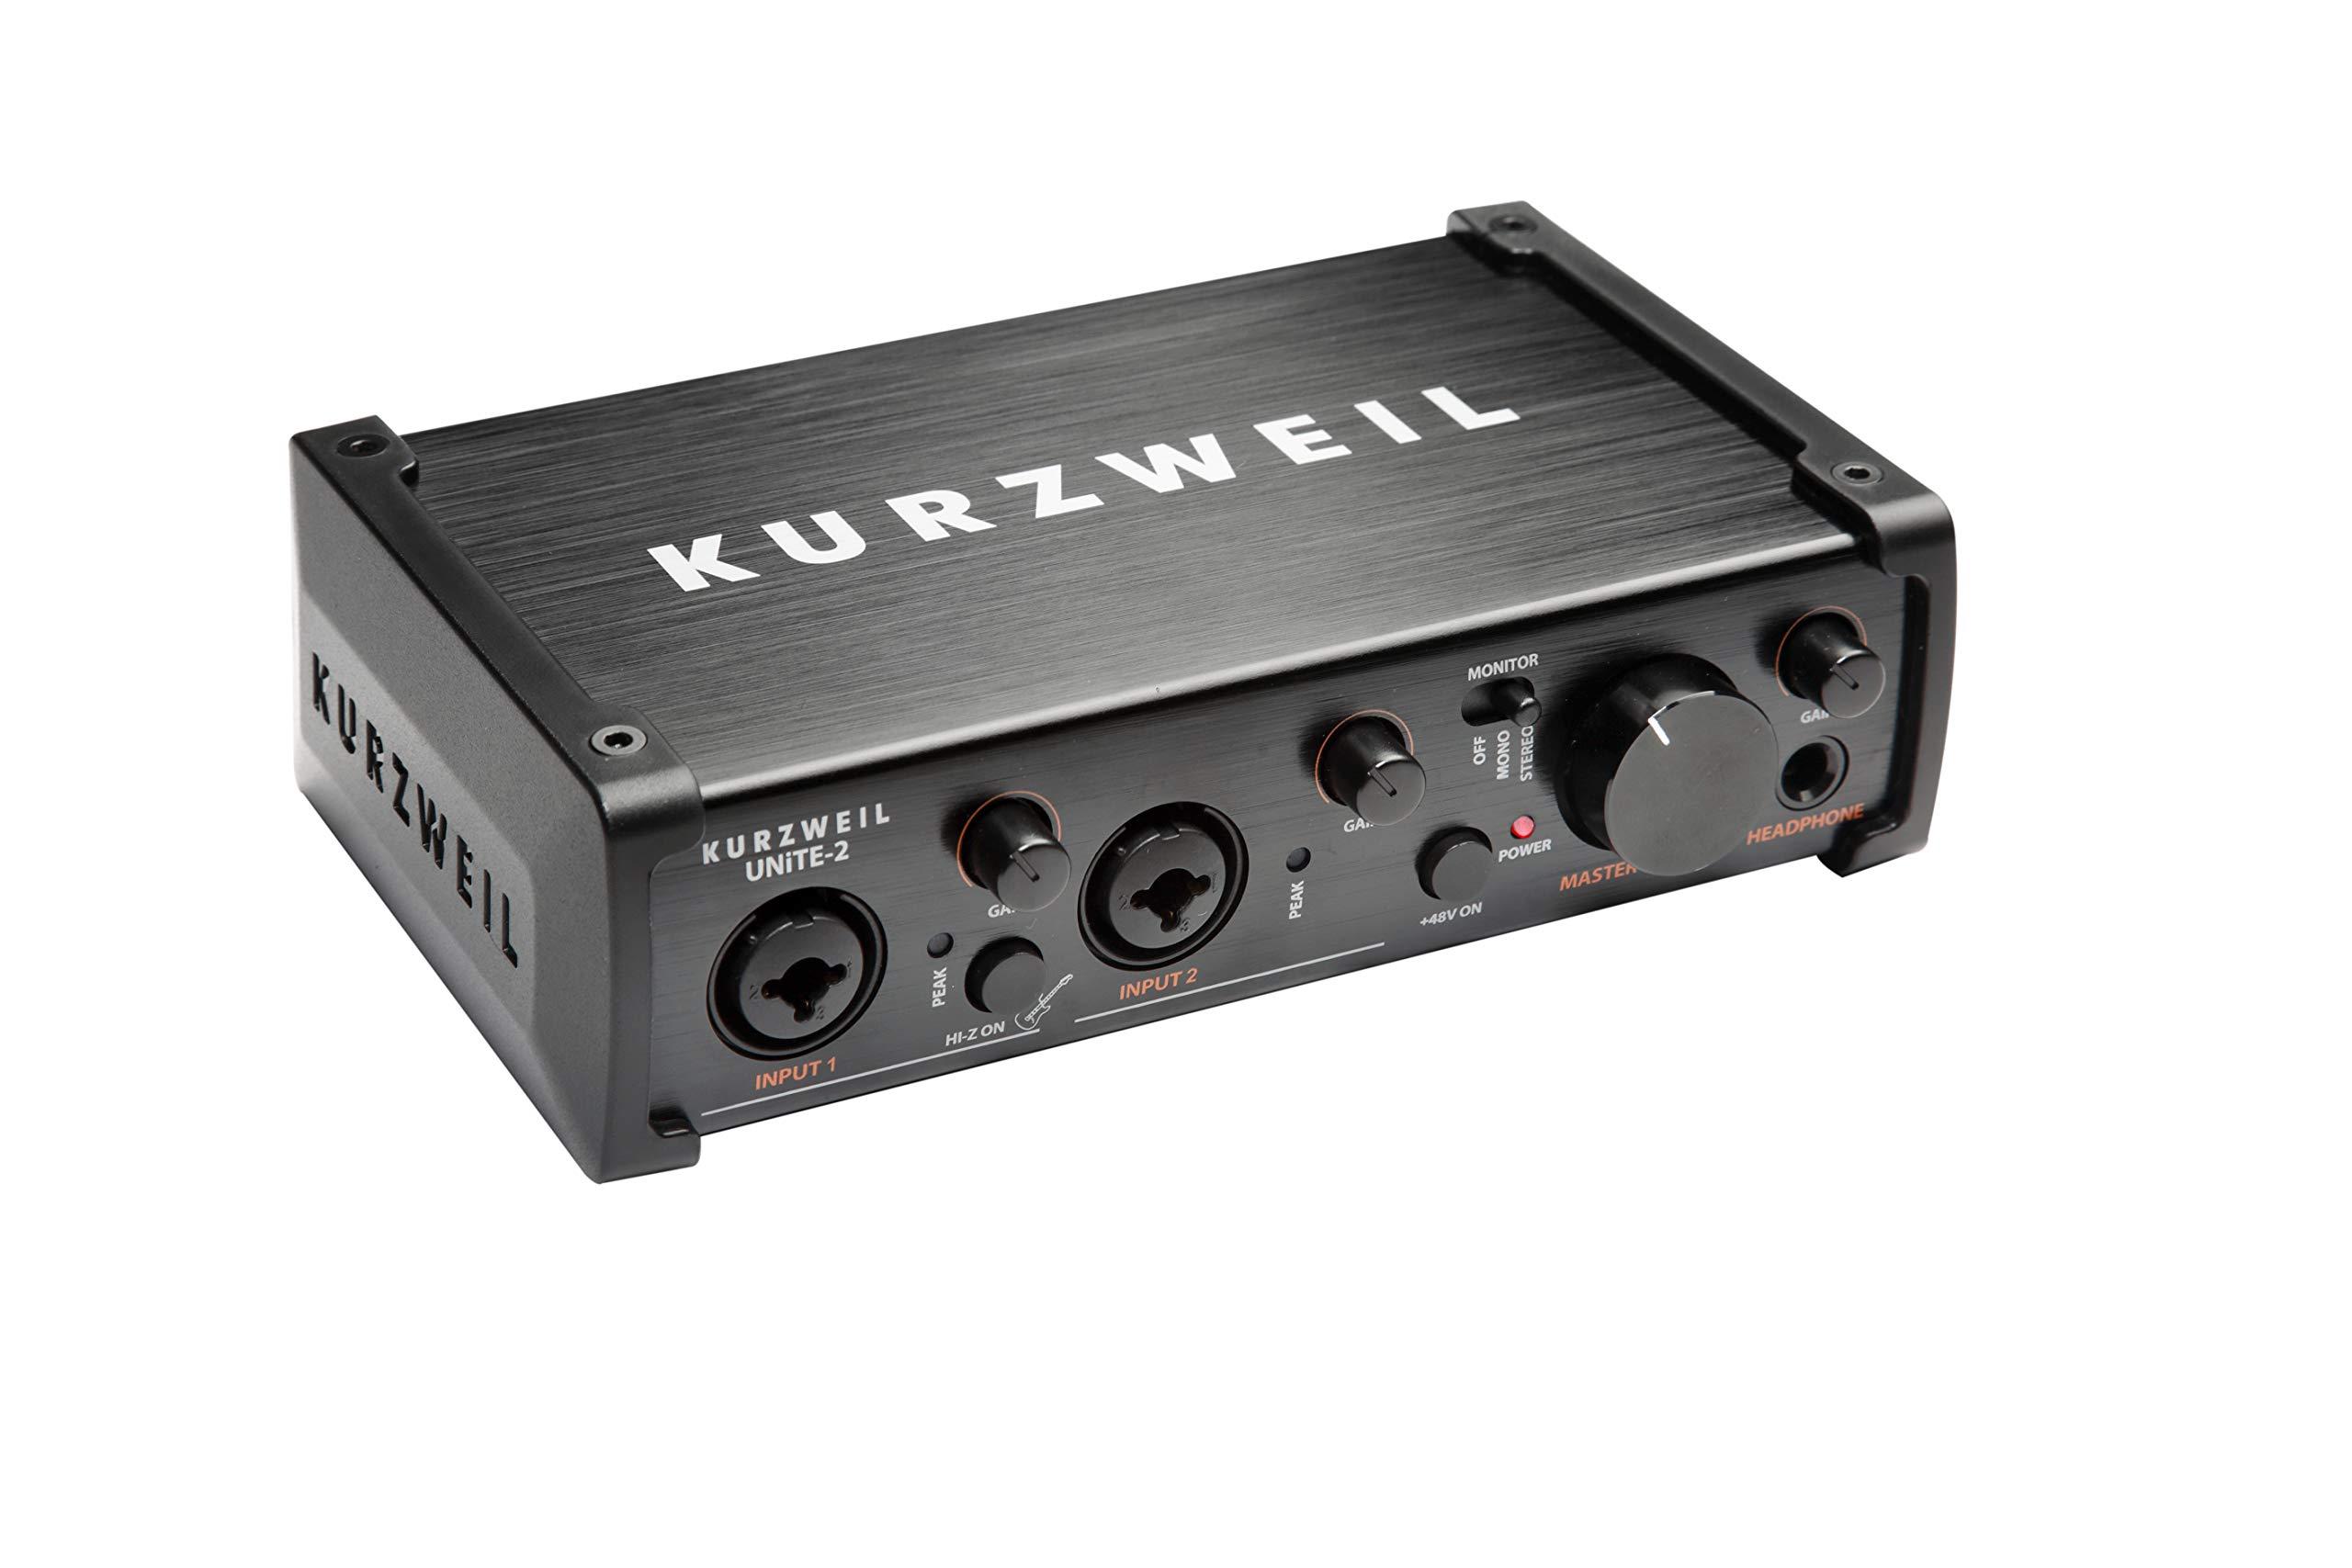 Kurzweil Music Systems Unite2 2-Channel USB Audio Interface (UNITE-2)